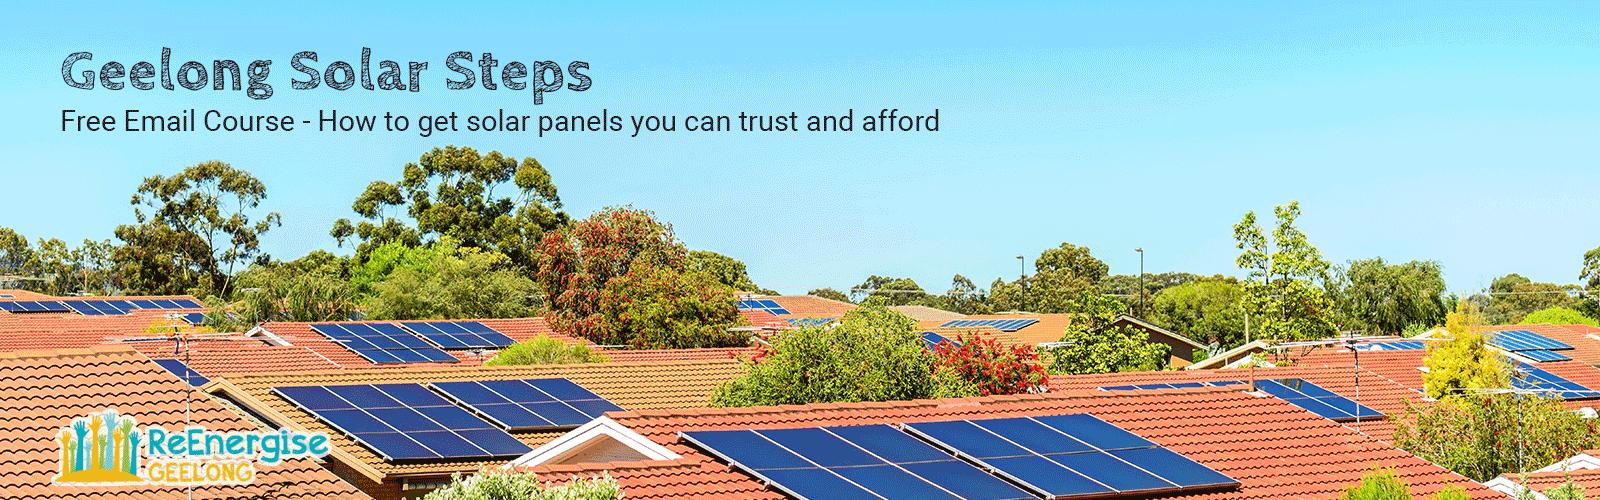 Geelong-Solar-Steps-Web-Slider-1600x500.png